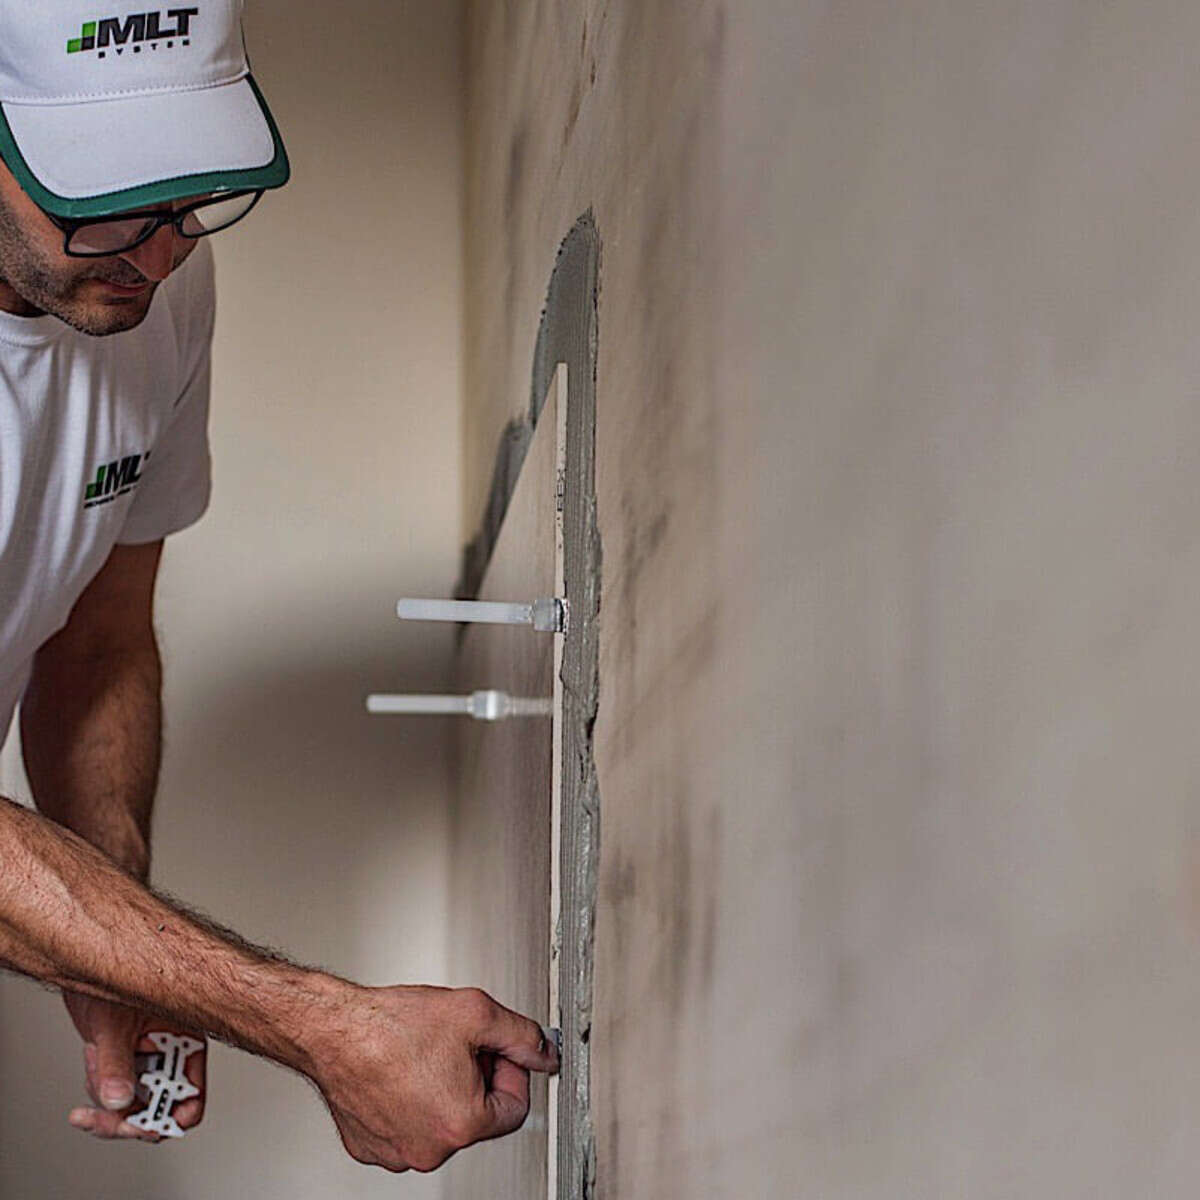 MLT Leveling Base Plates wall installation bathroom